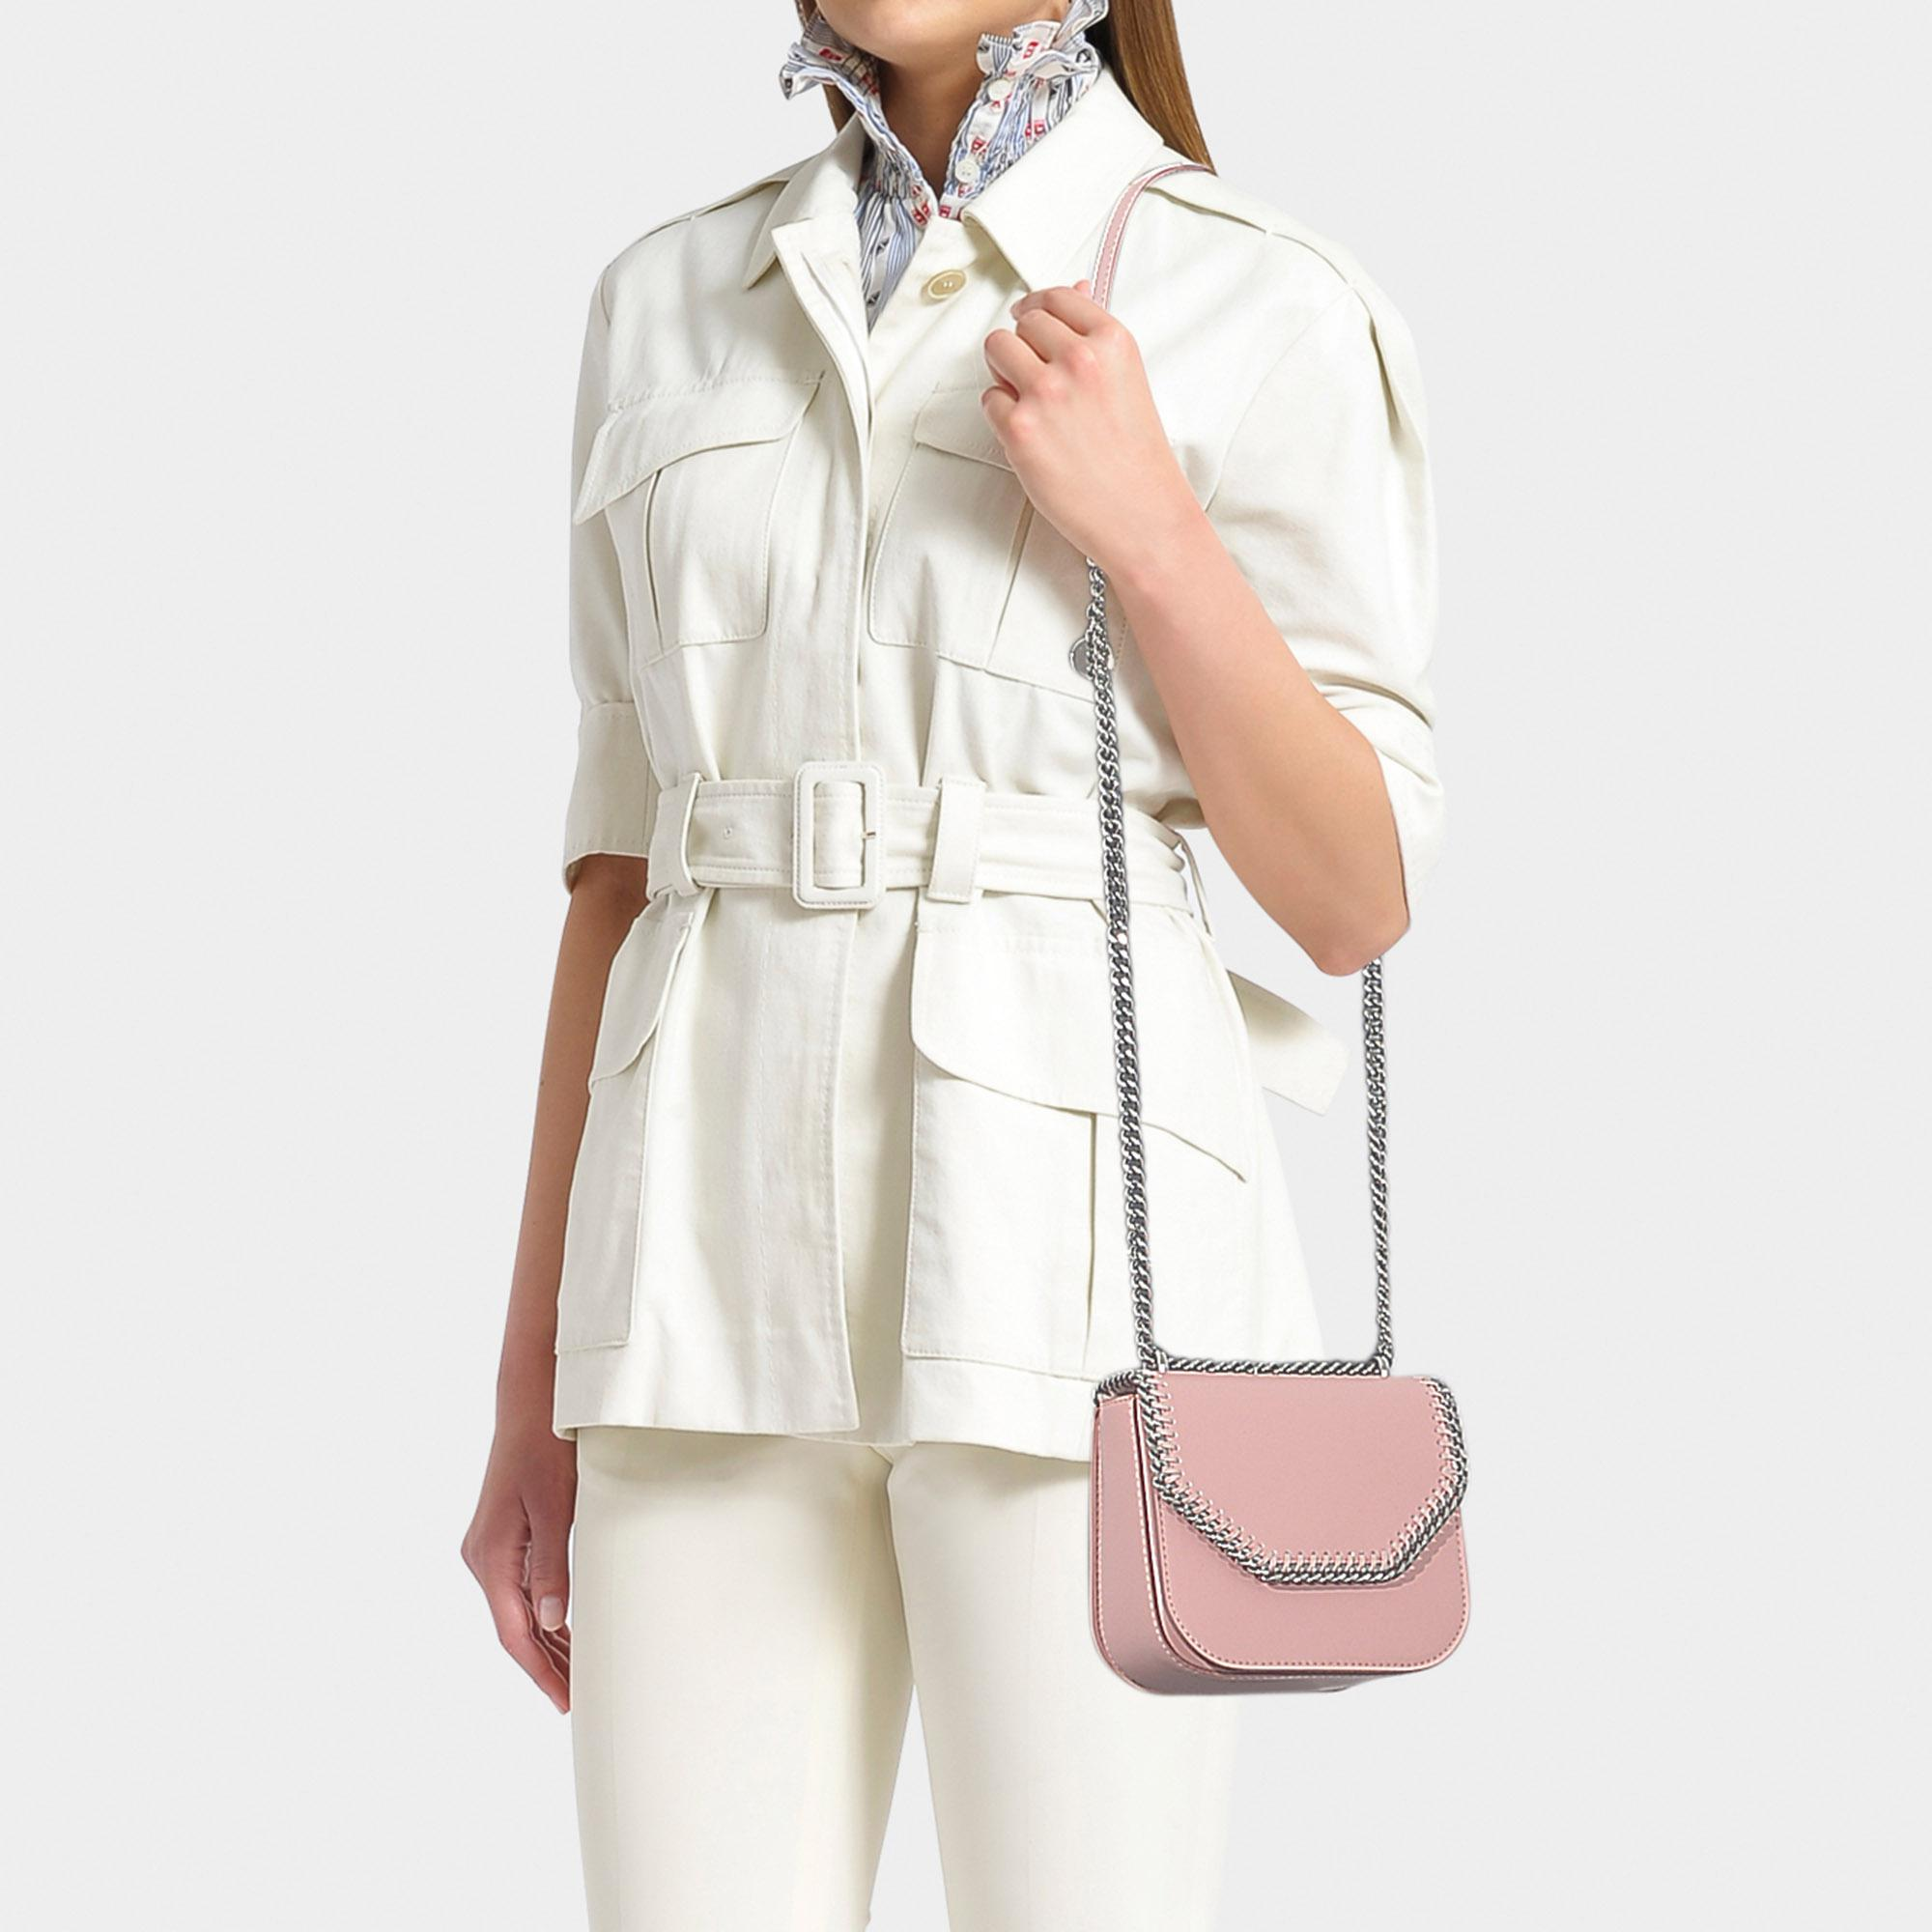 59c5335528d4 Stella McCartney - Pink Mini Falabella Box Shoulder Bag In New Blush  Synthetic Material - Lyst. View fullscreen